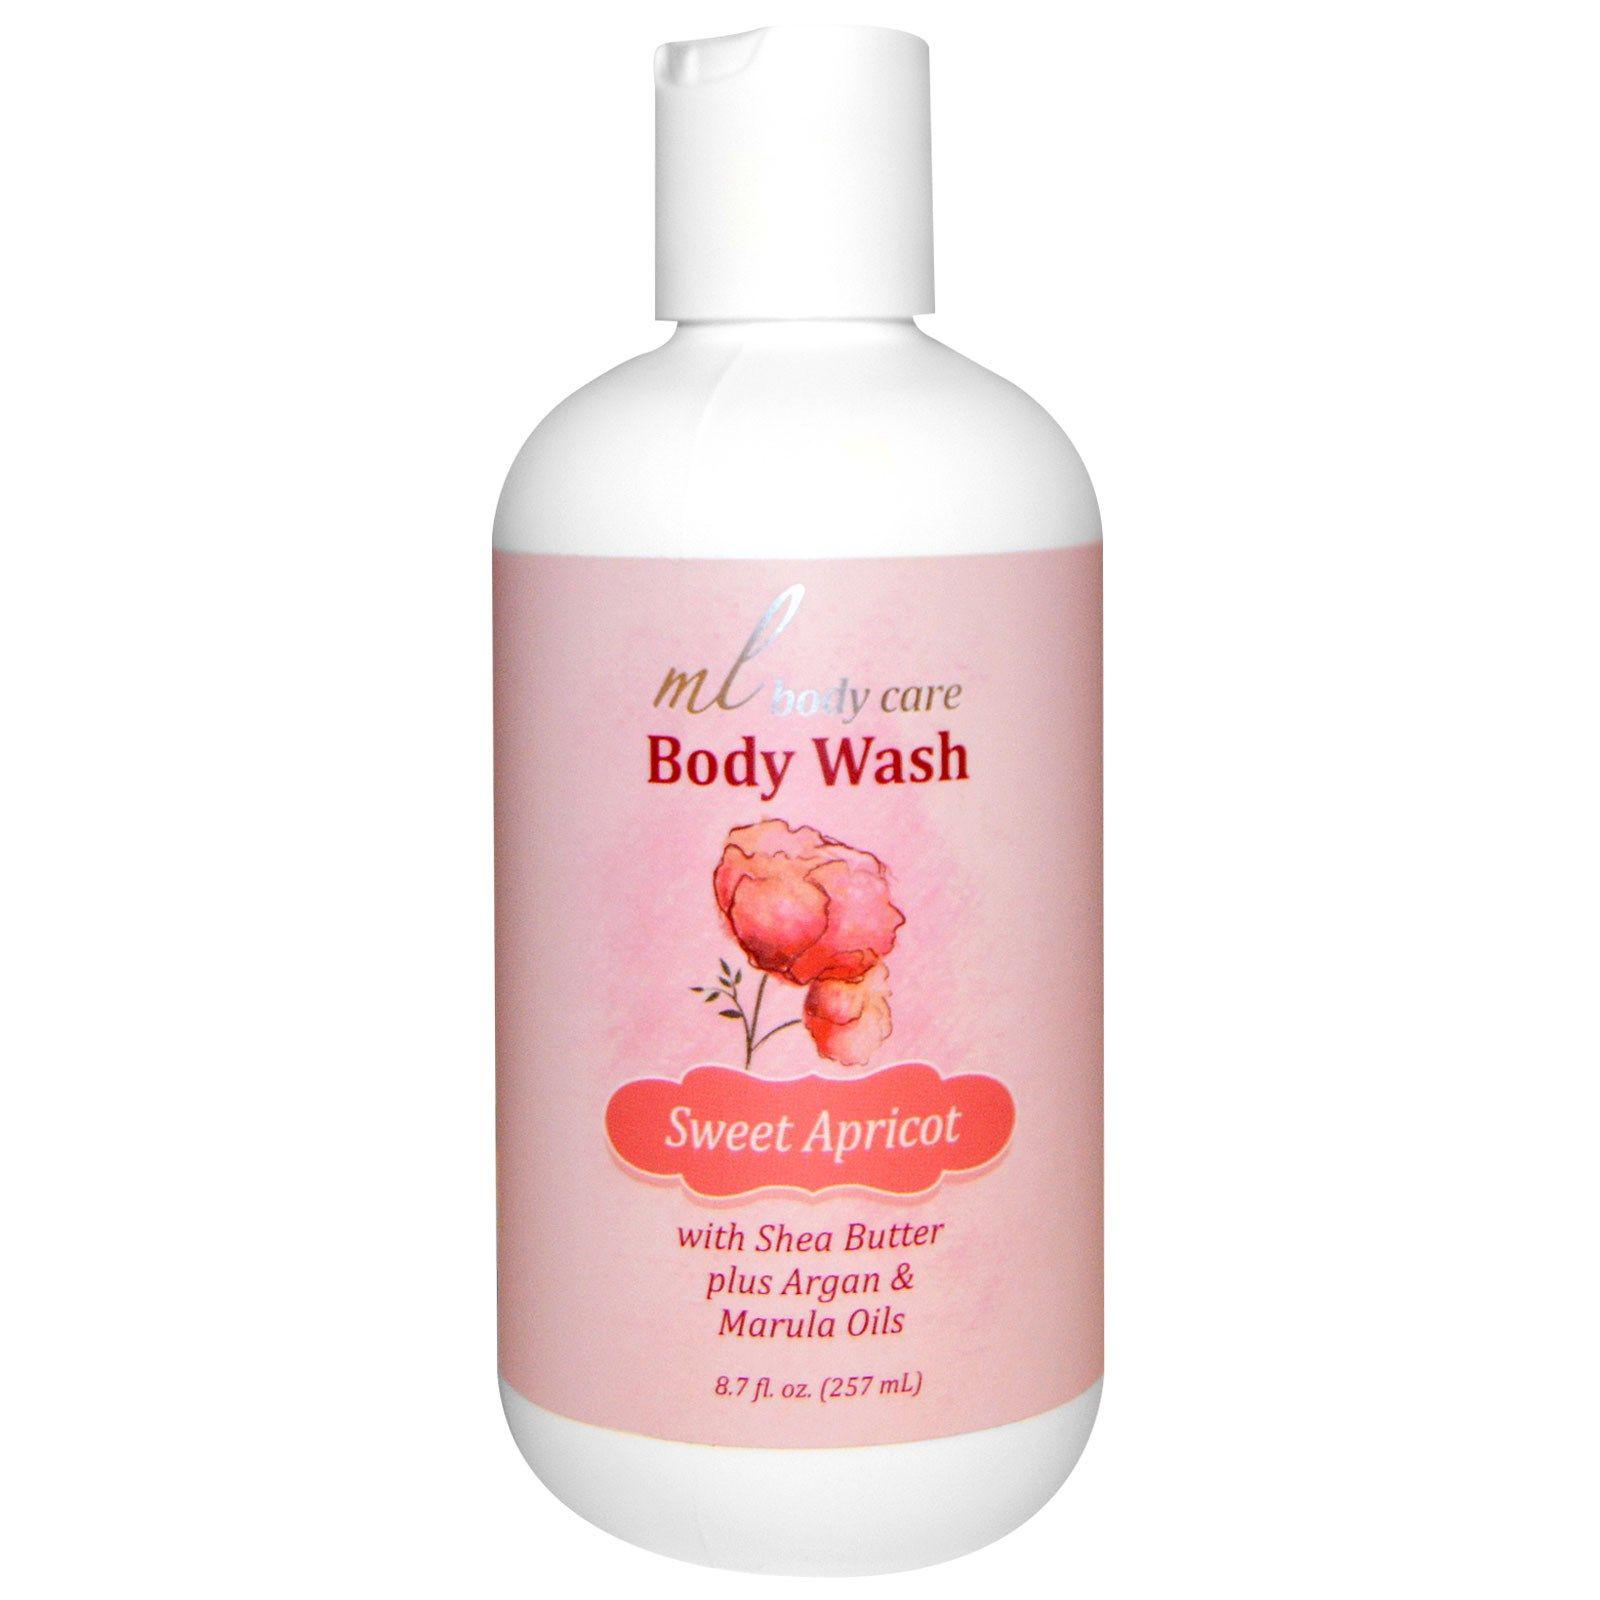 Madre Labs Argan Oil Body Wash Sweet Apricot 87 Fl Oz 257 Ml